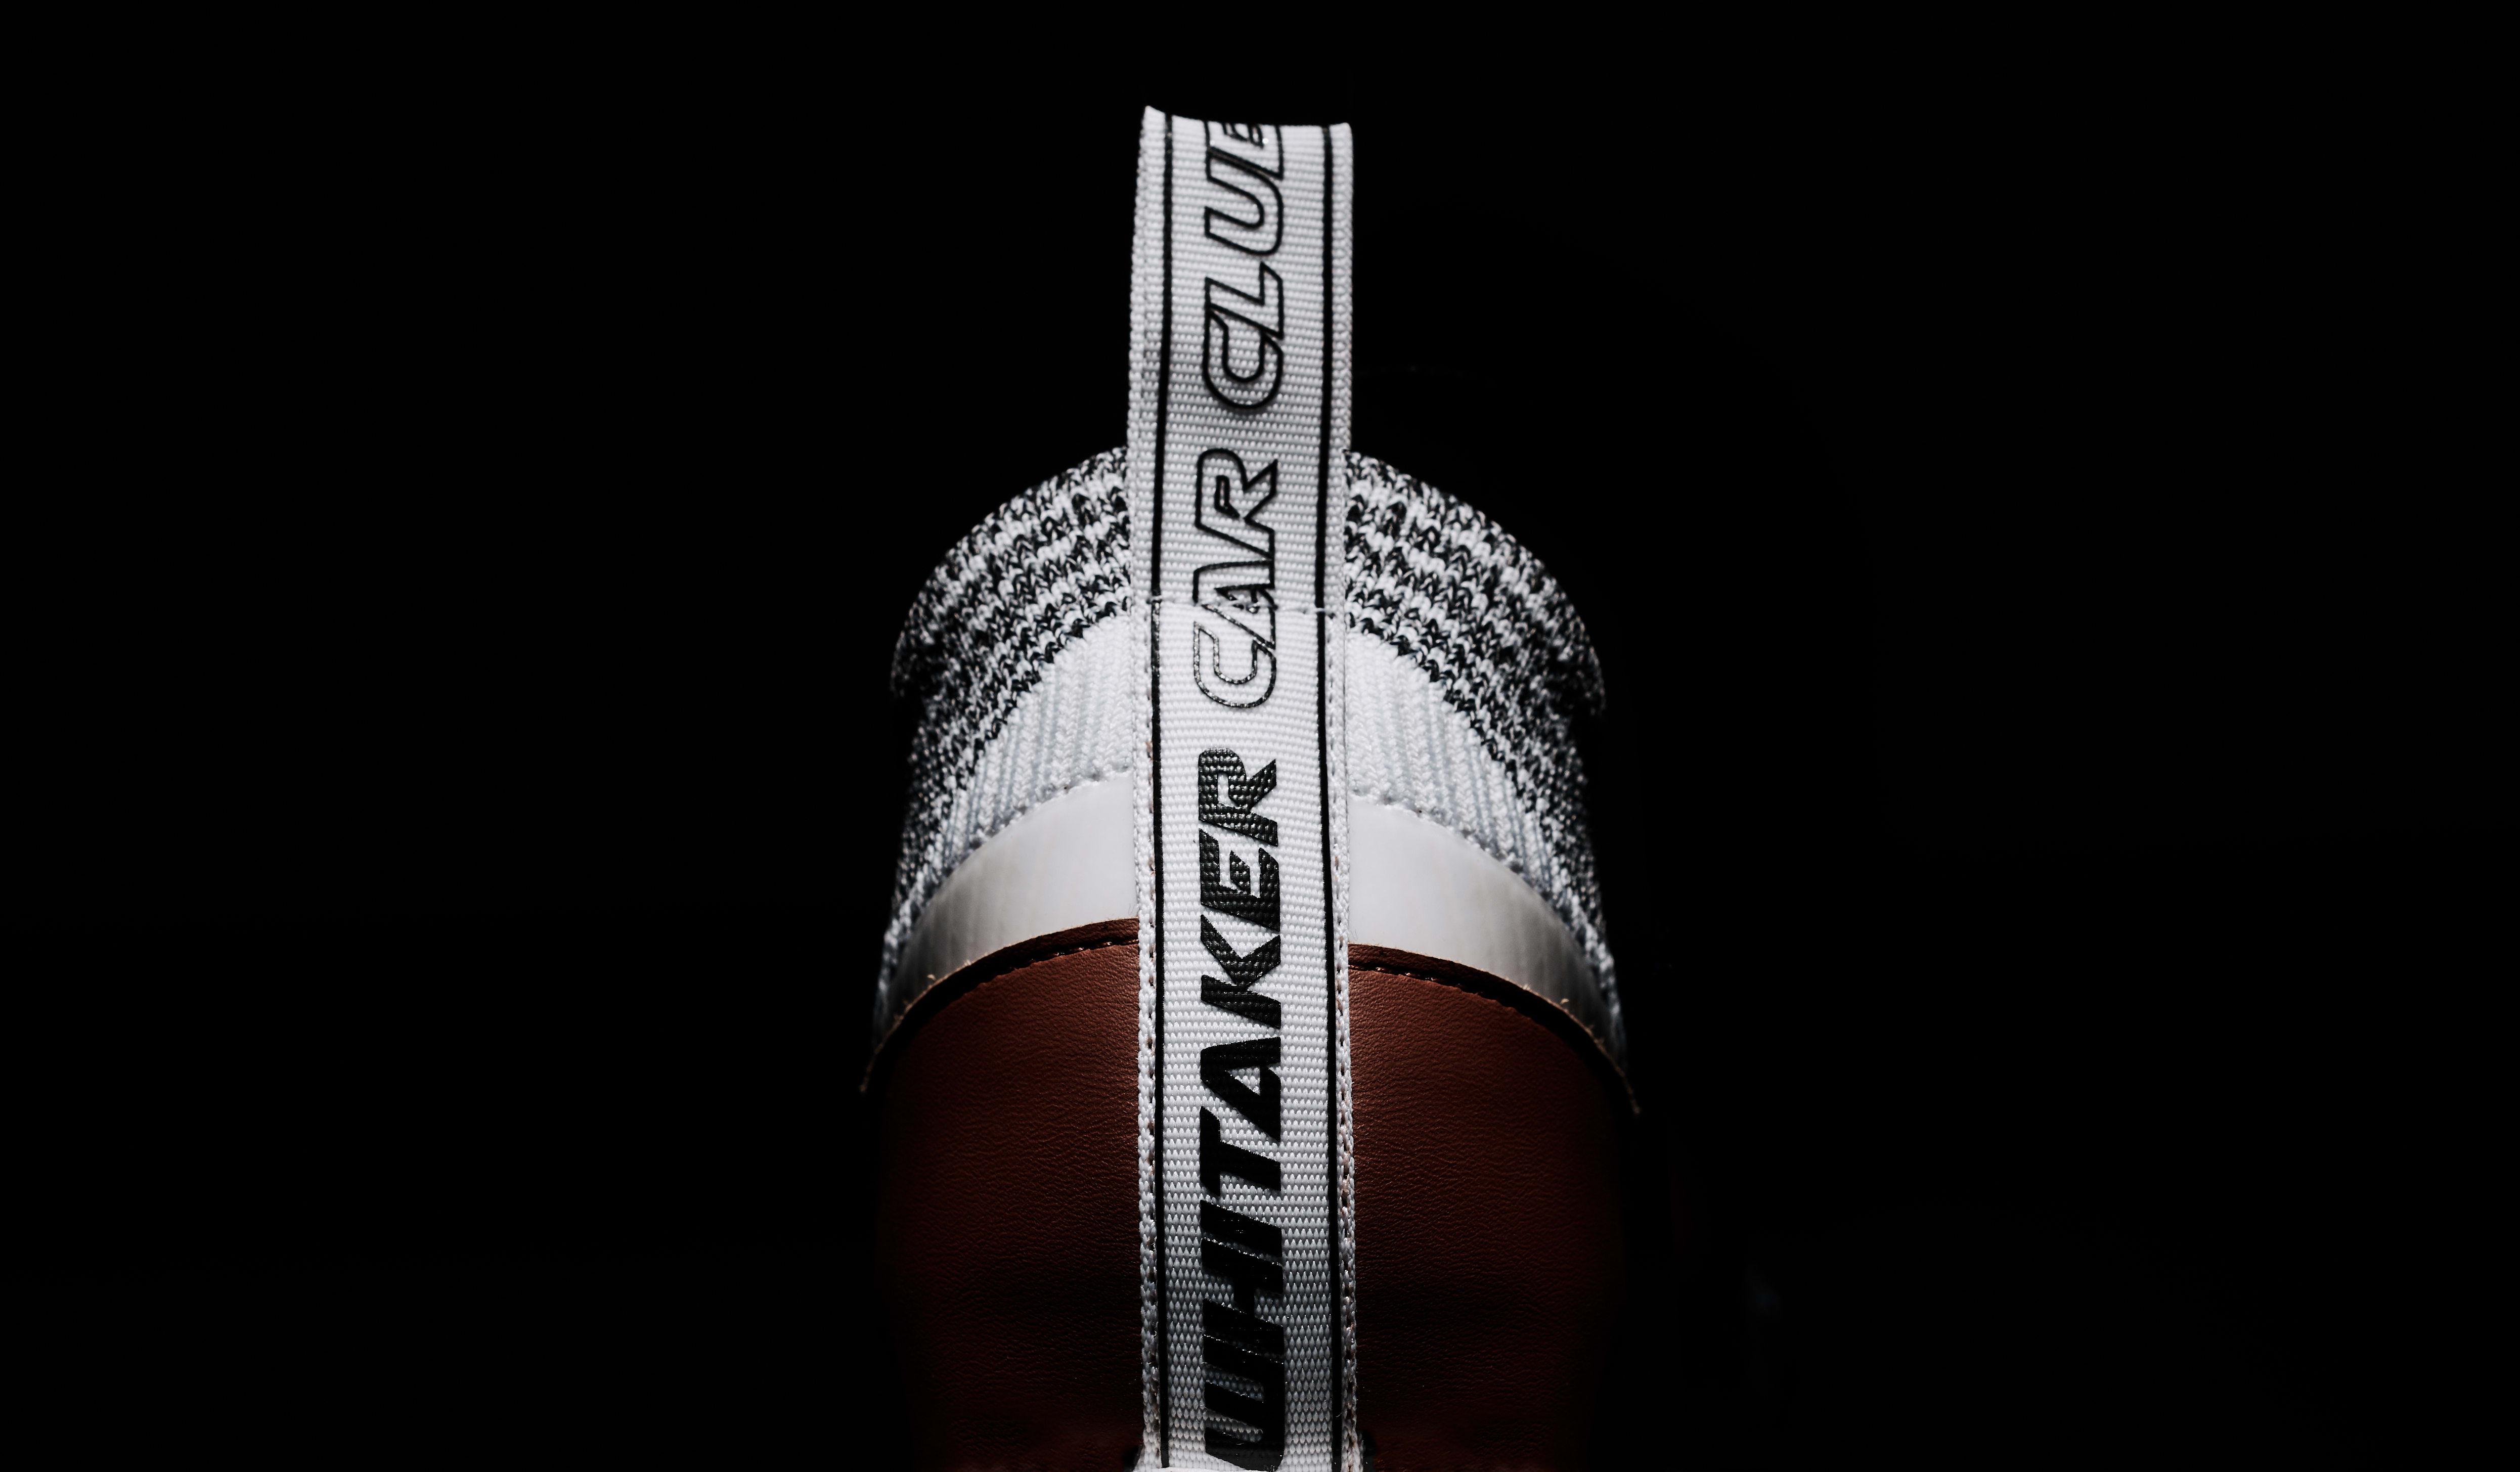 Whitaker Car Club x Adidas NMD Racer AC8223 (Heel)